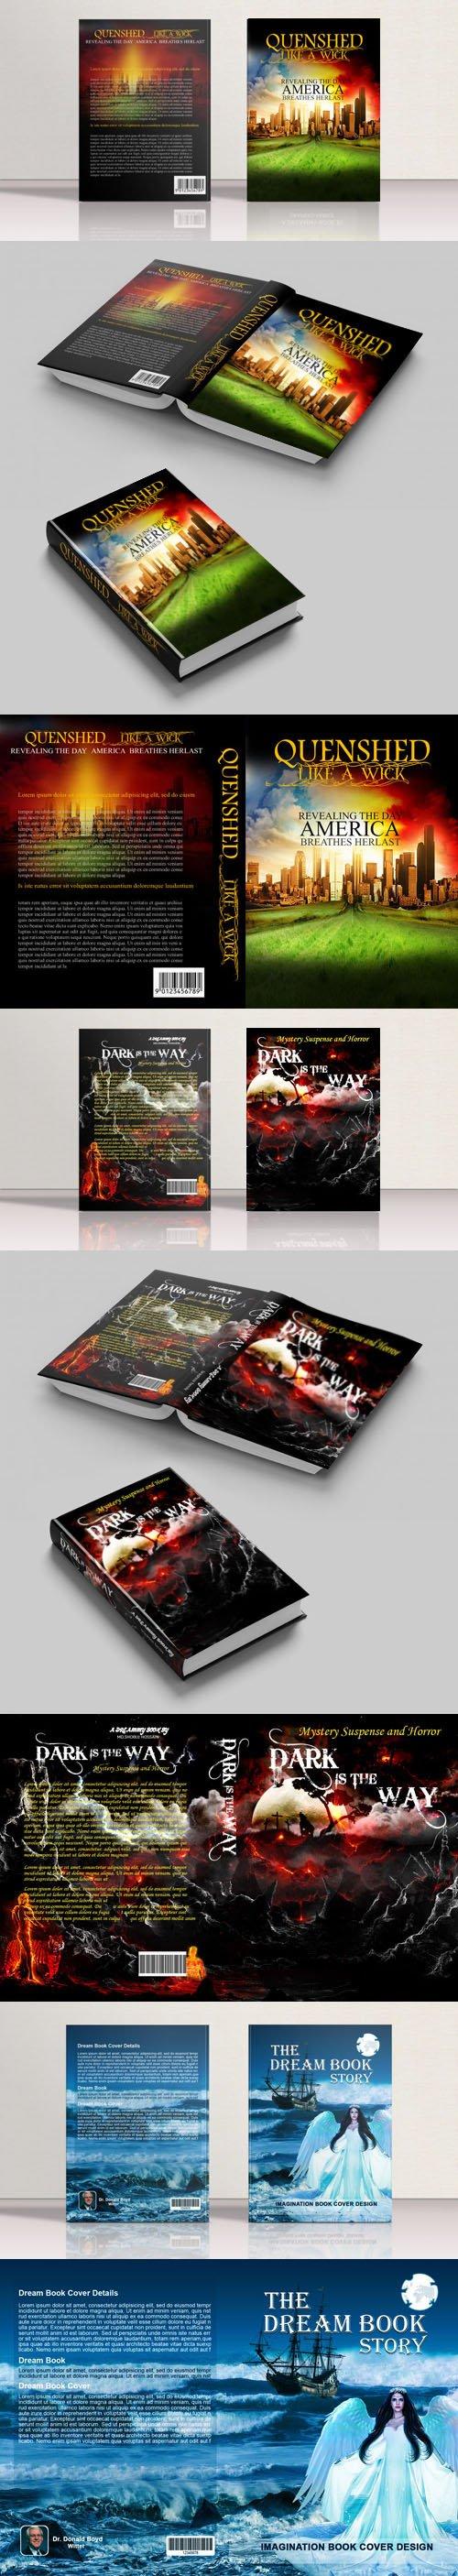 Suspense Historical & Story Book Cover Design PSD Templates